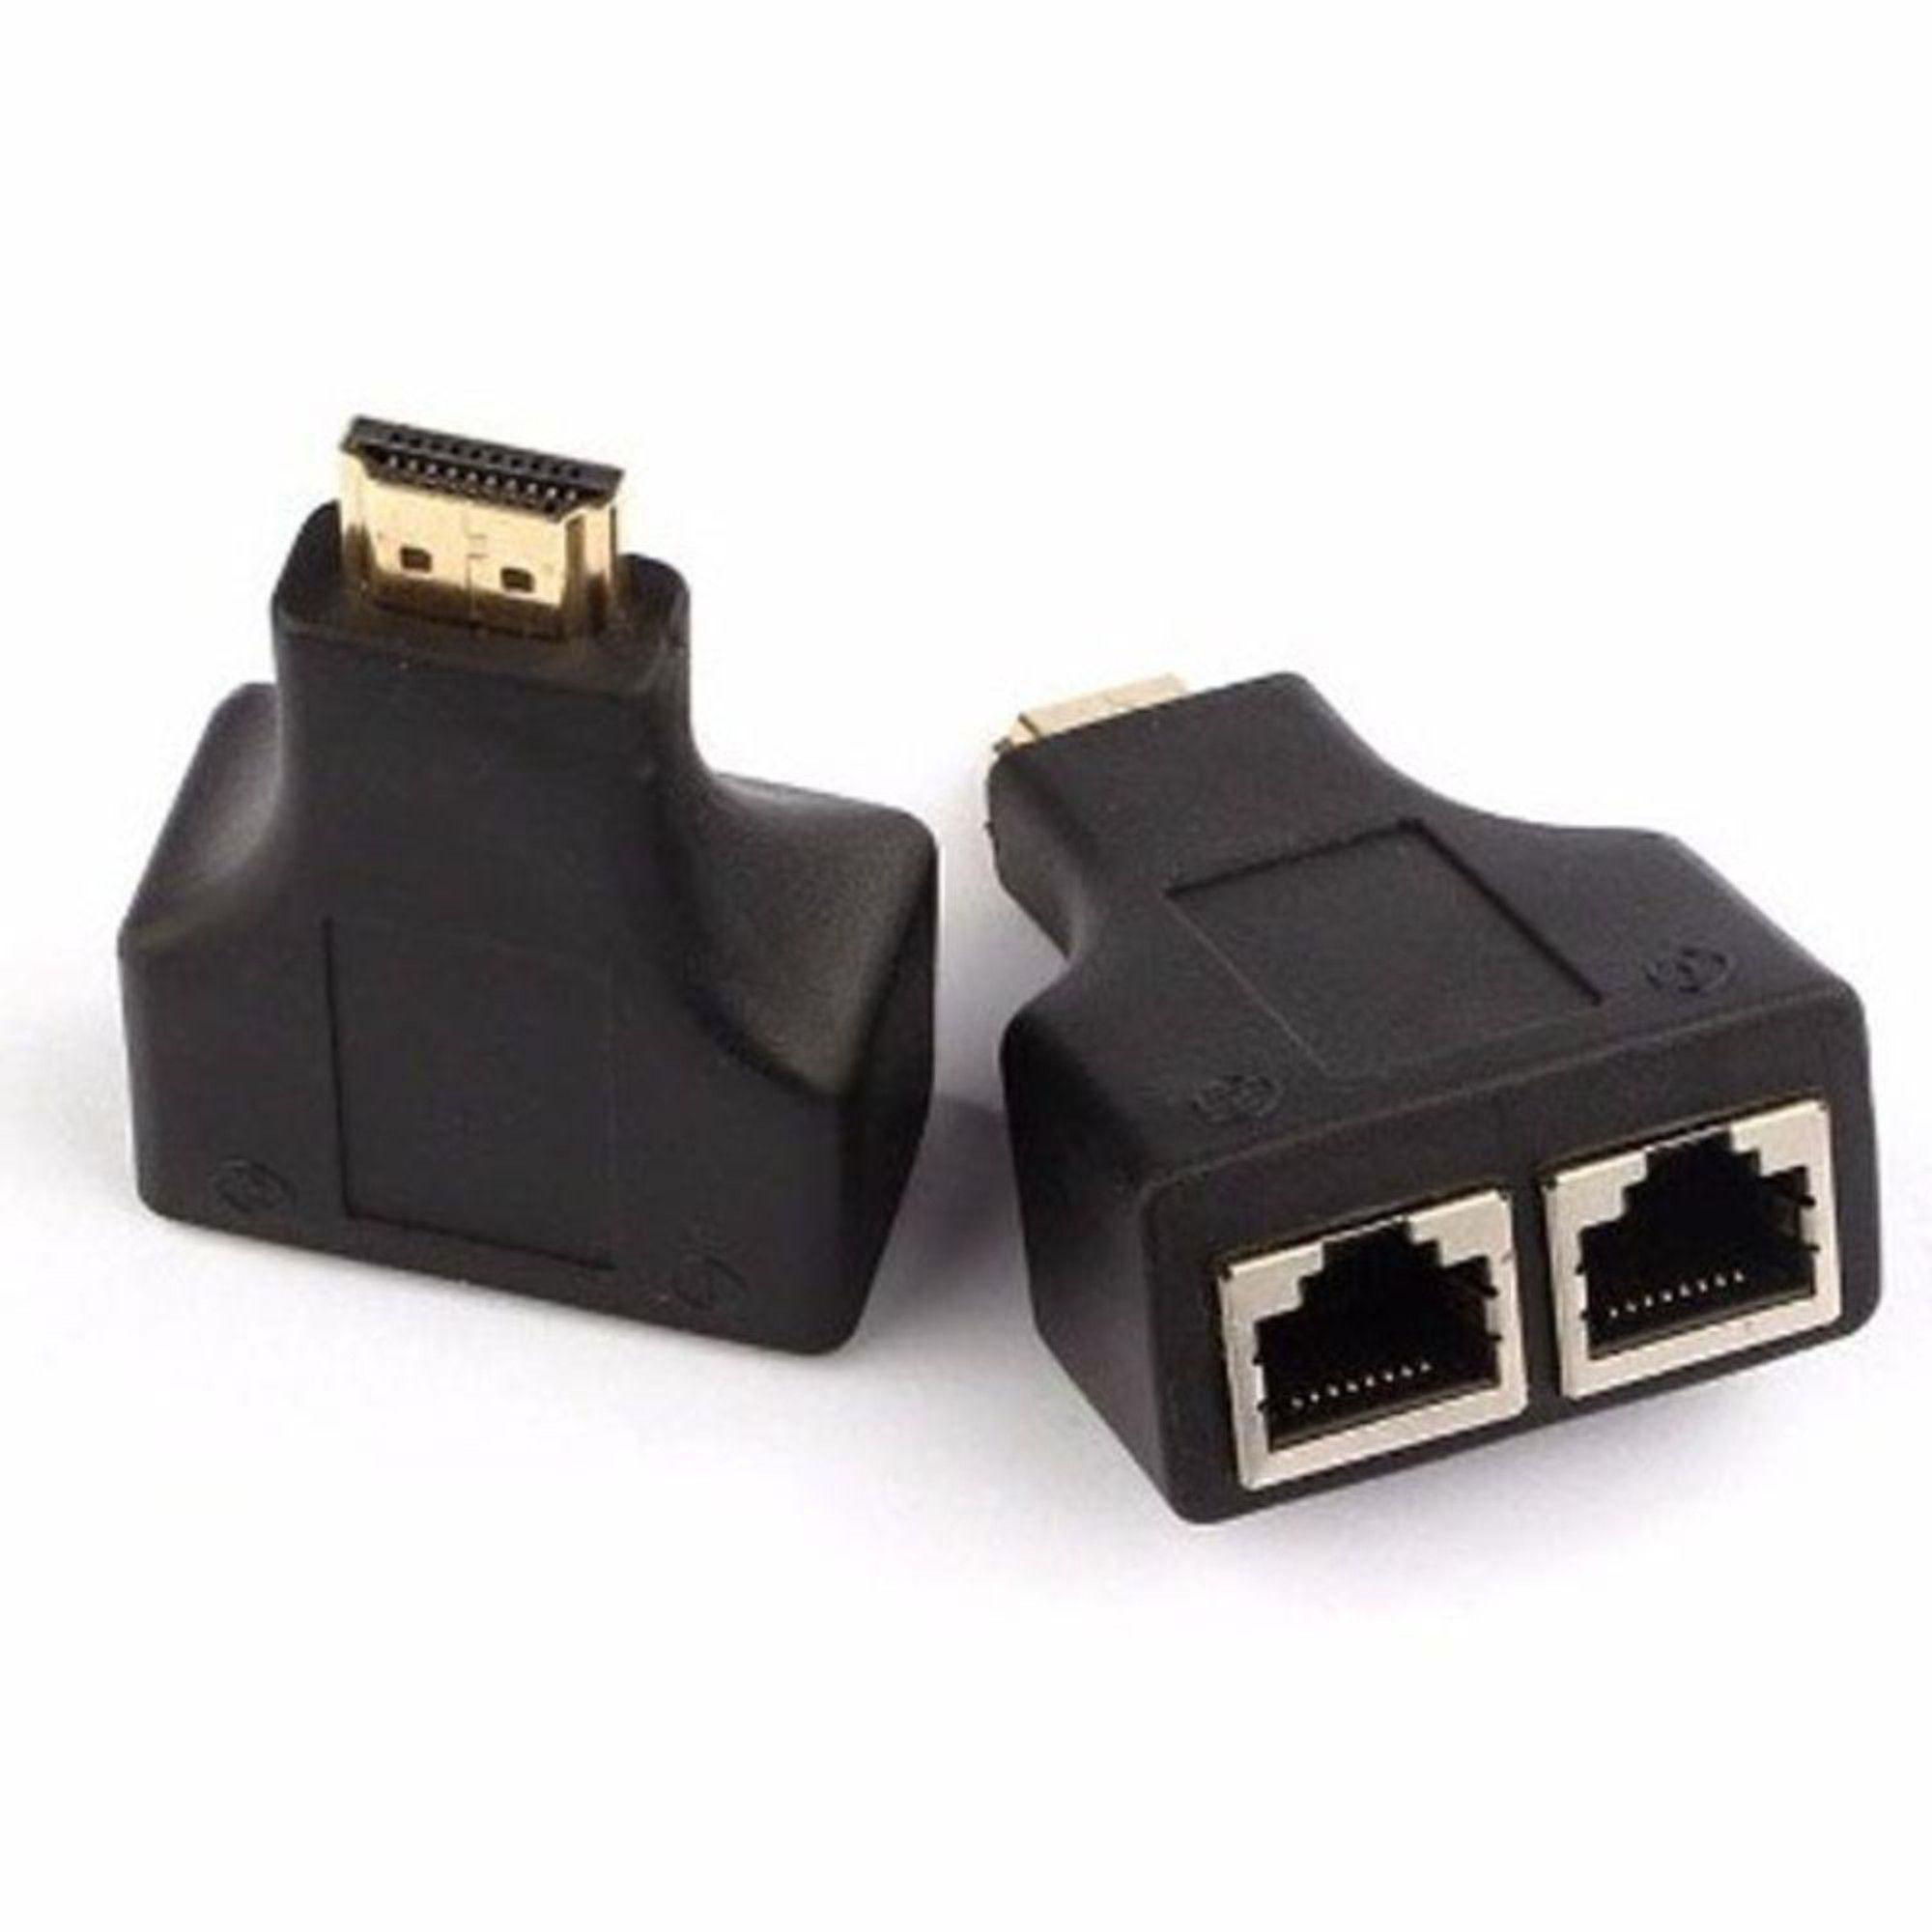 Adaptador HDMI 3D Cabo De Rede Utp Rj45 Cat5/6 Lan Ate 30m C/ 2 Unidades